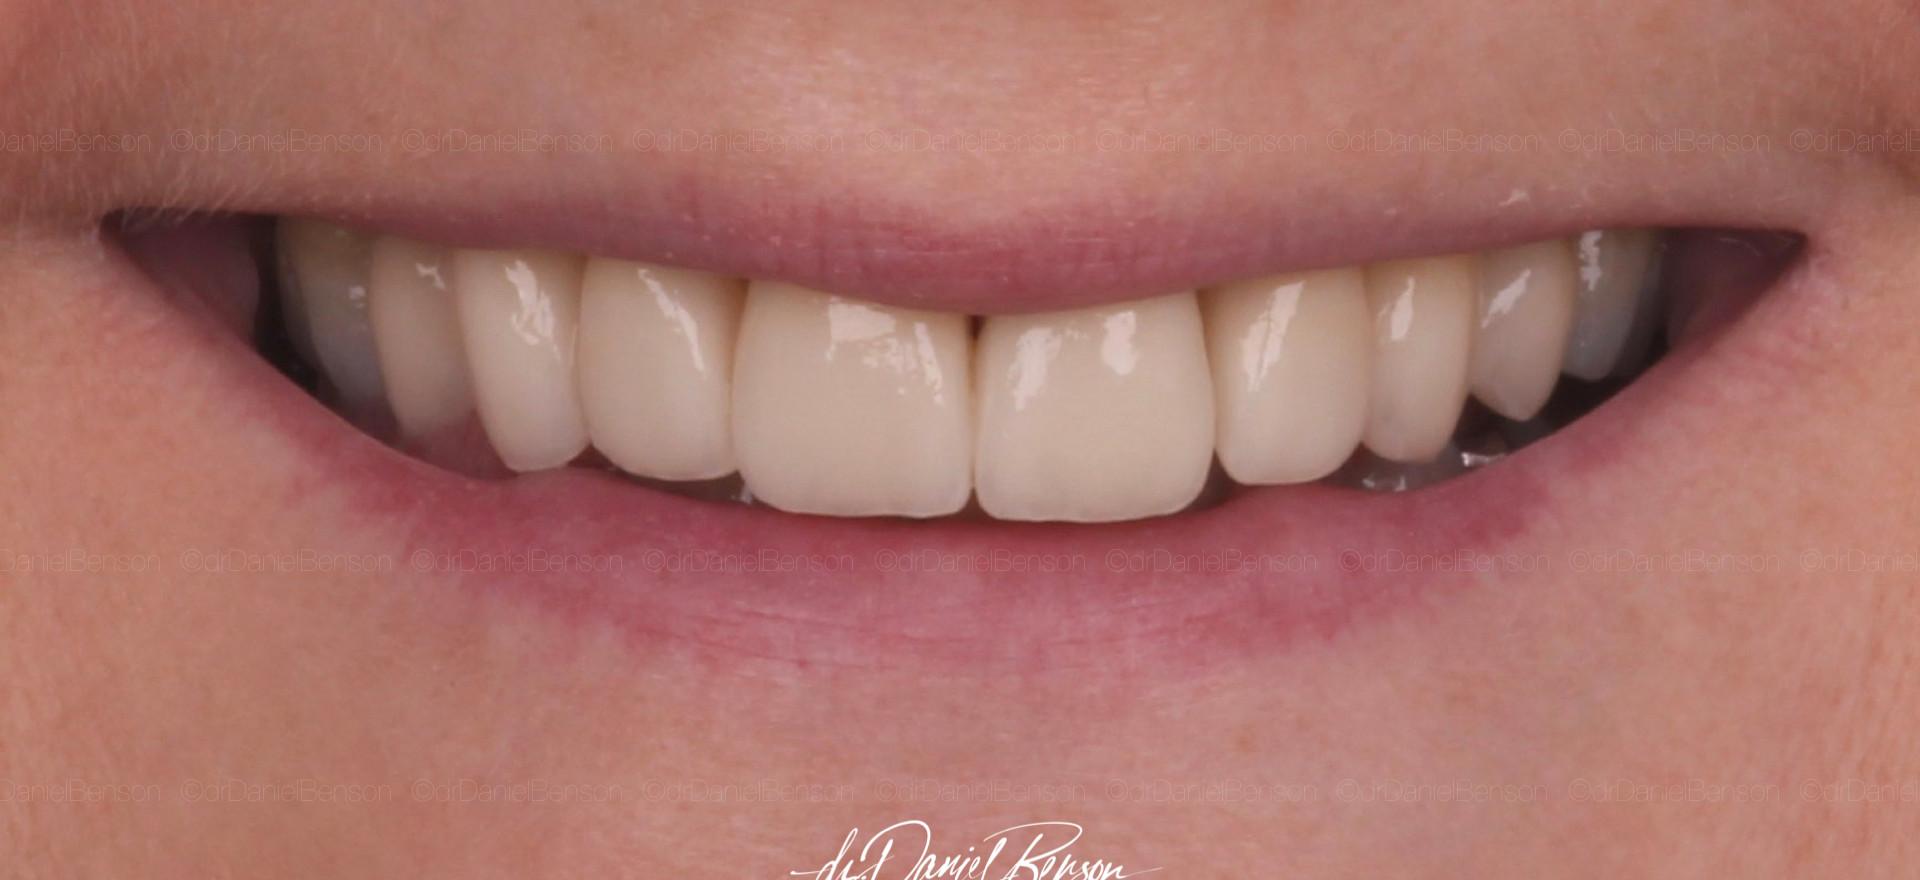 Final All-Ceramic smile